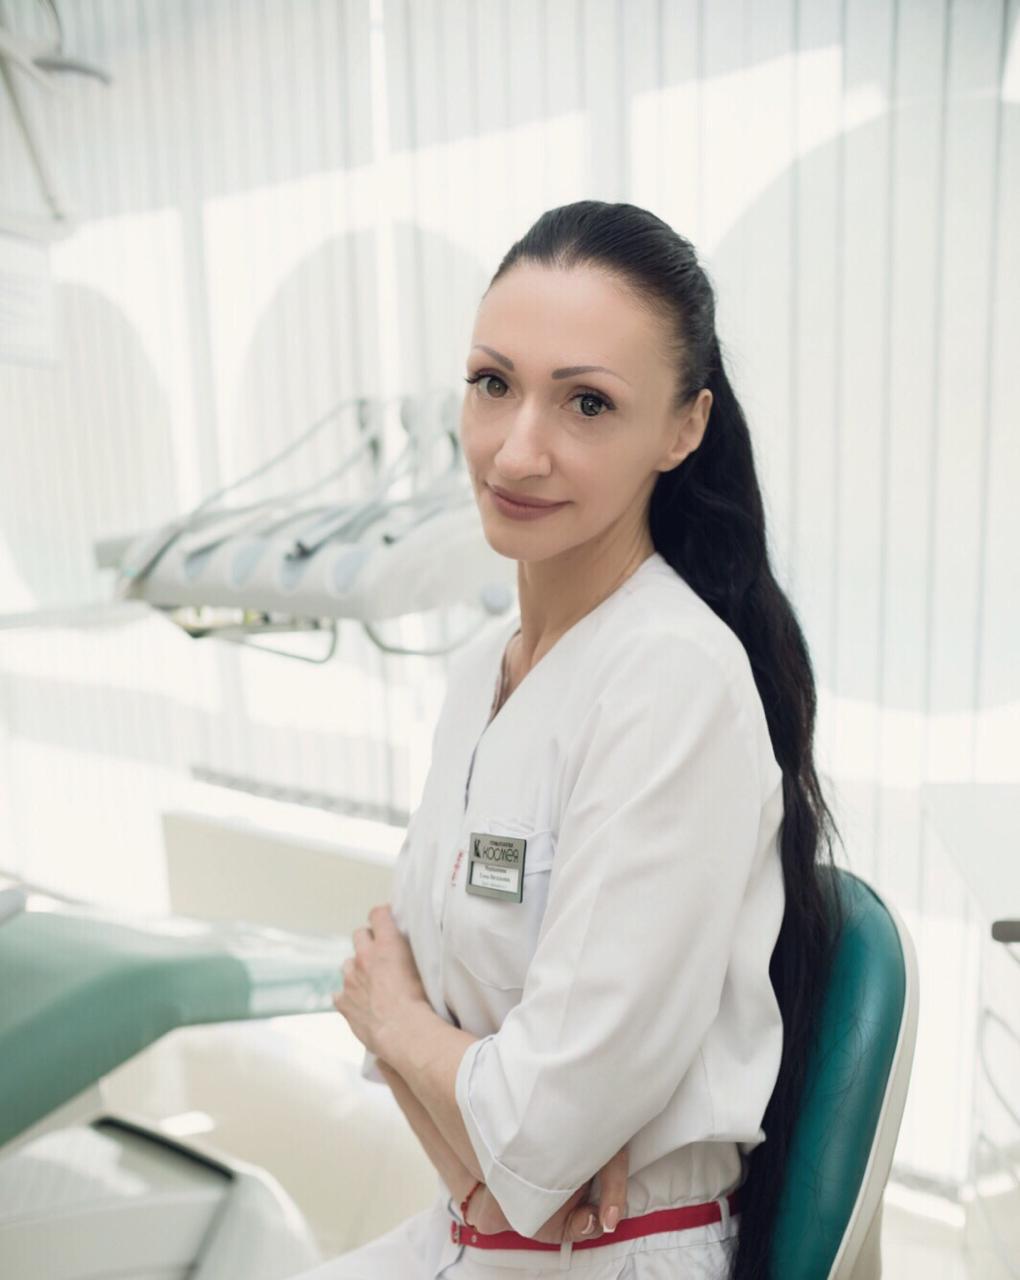 врач стоматолог-терапевт World Dent